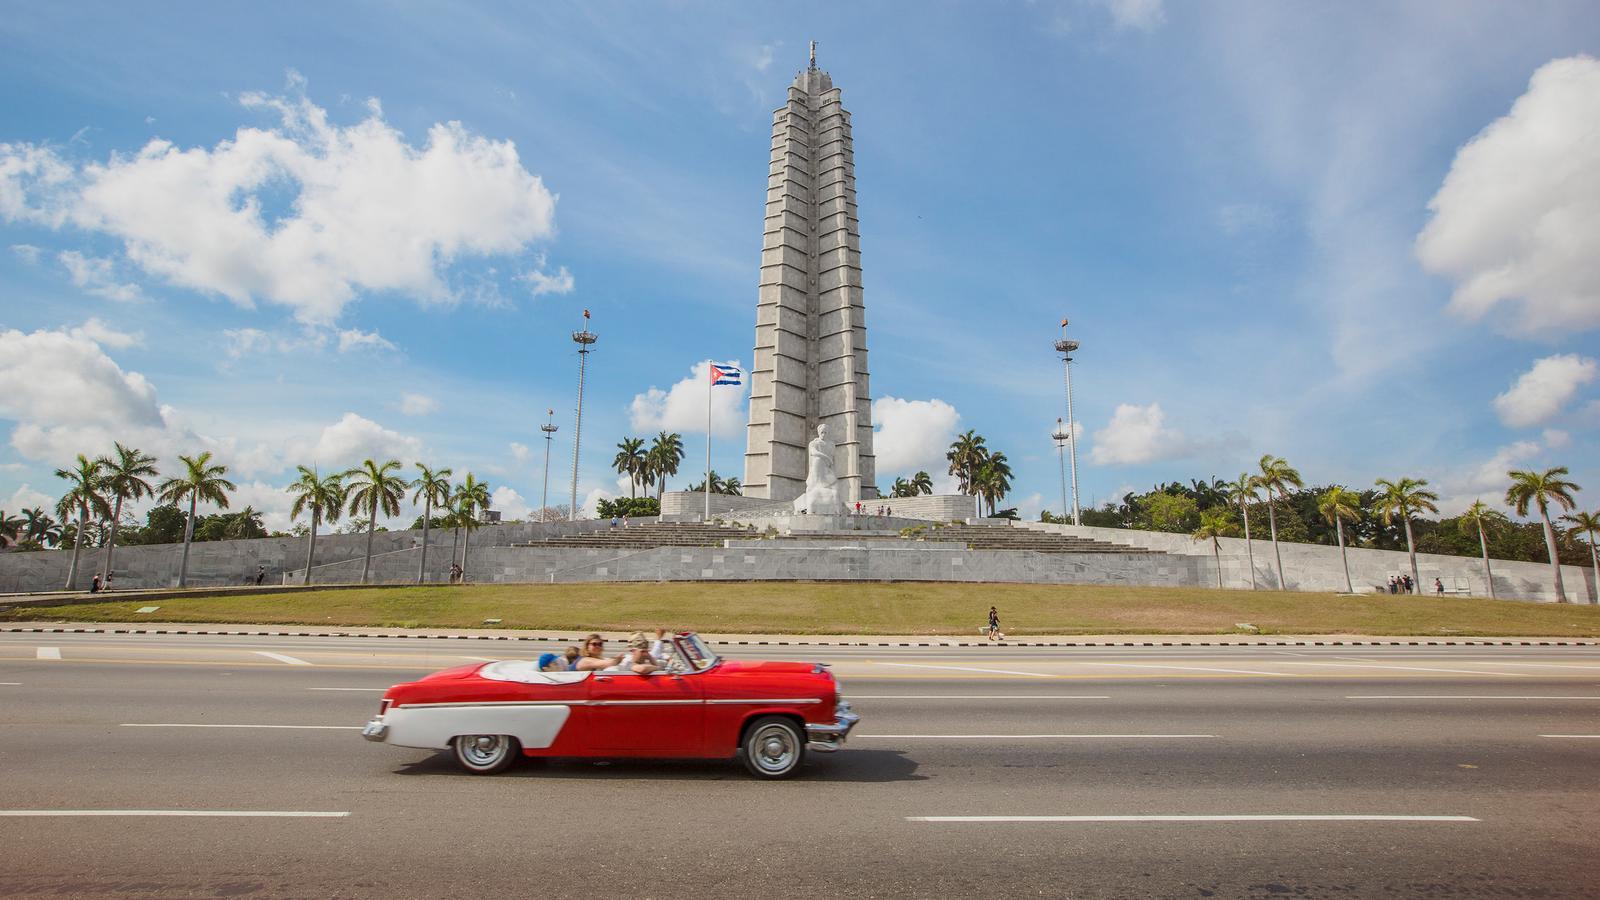 Cuba Libre in Cuba Central America G Adventures